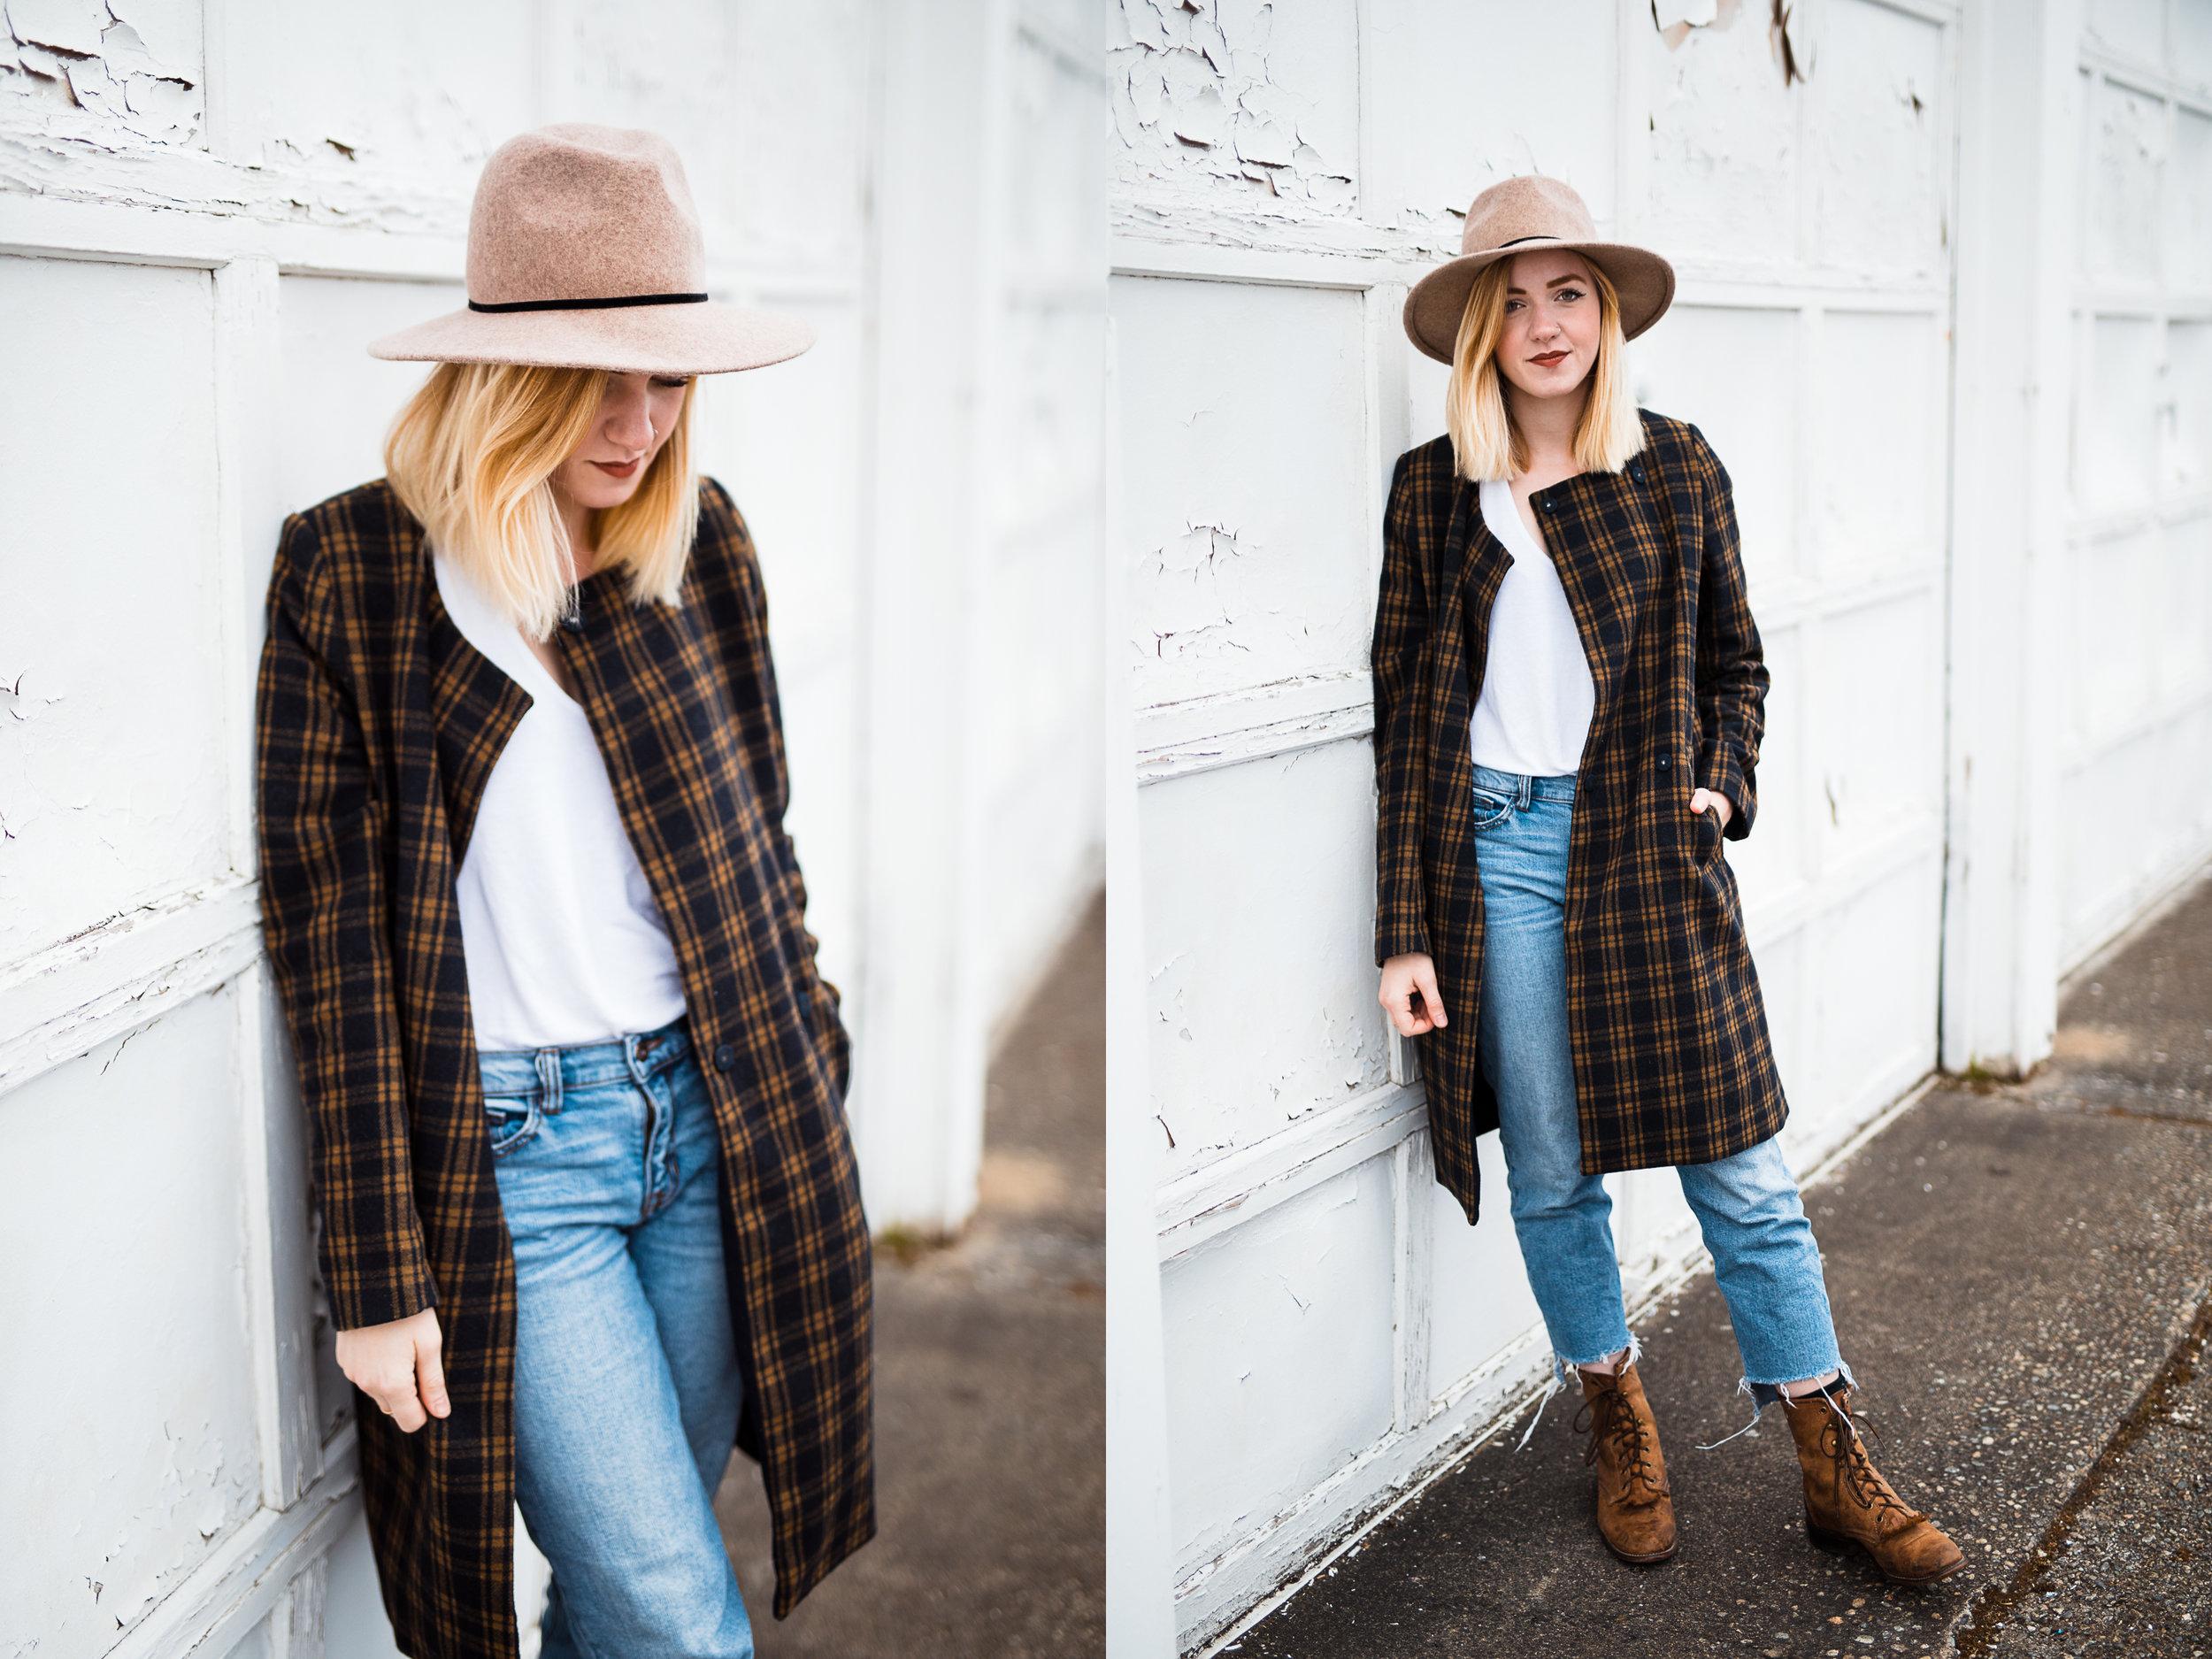 4-22-2017 Aimee Tomlinson Portraits Blog Diptych 2.jpg